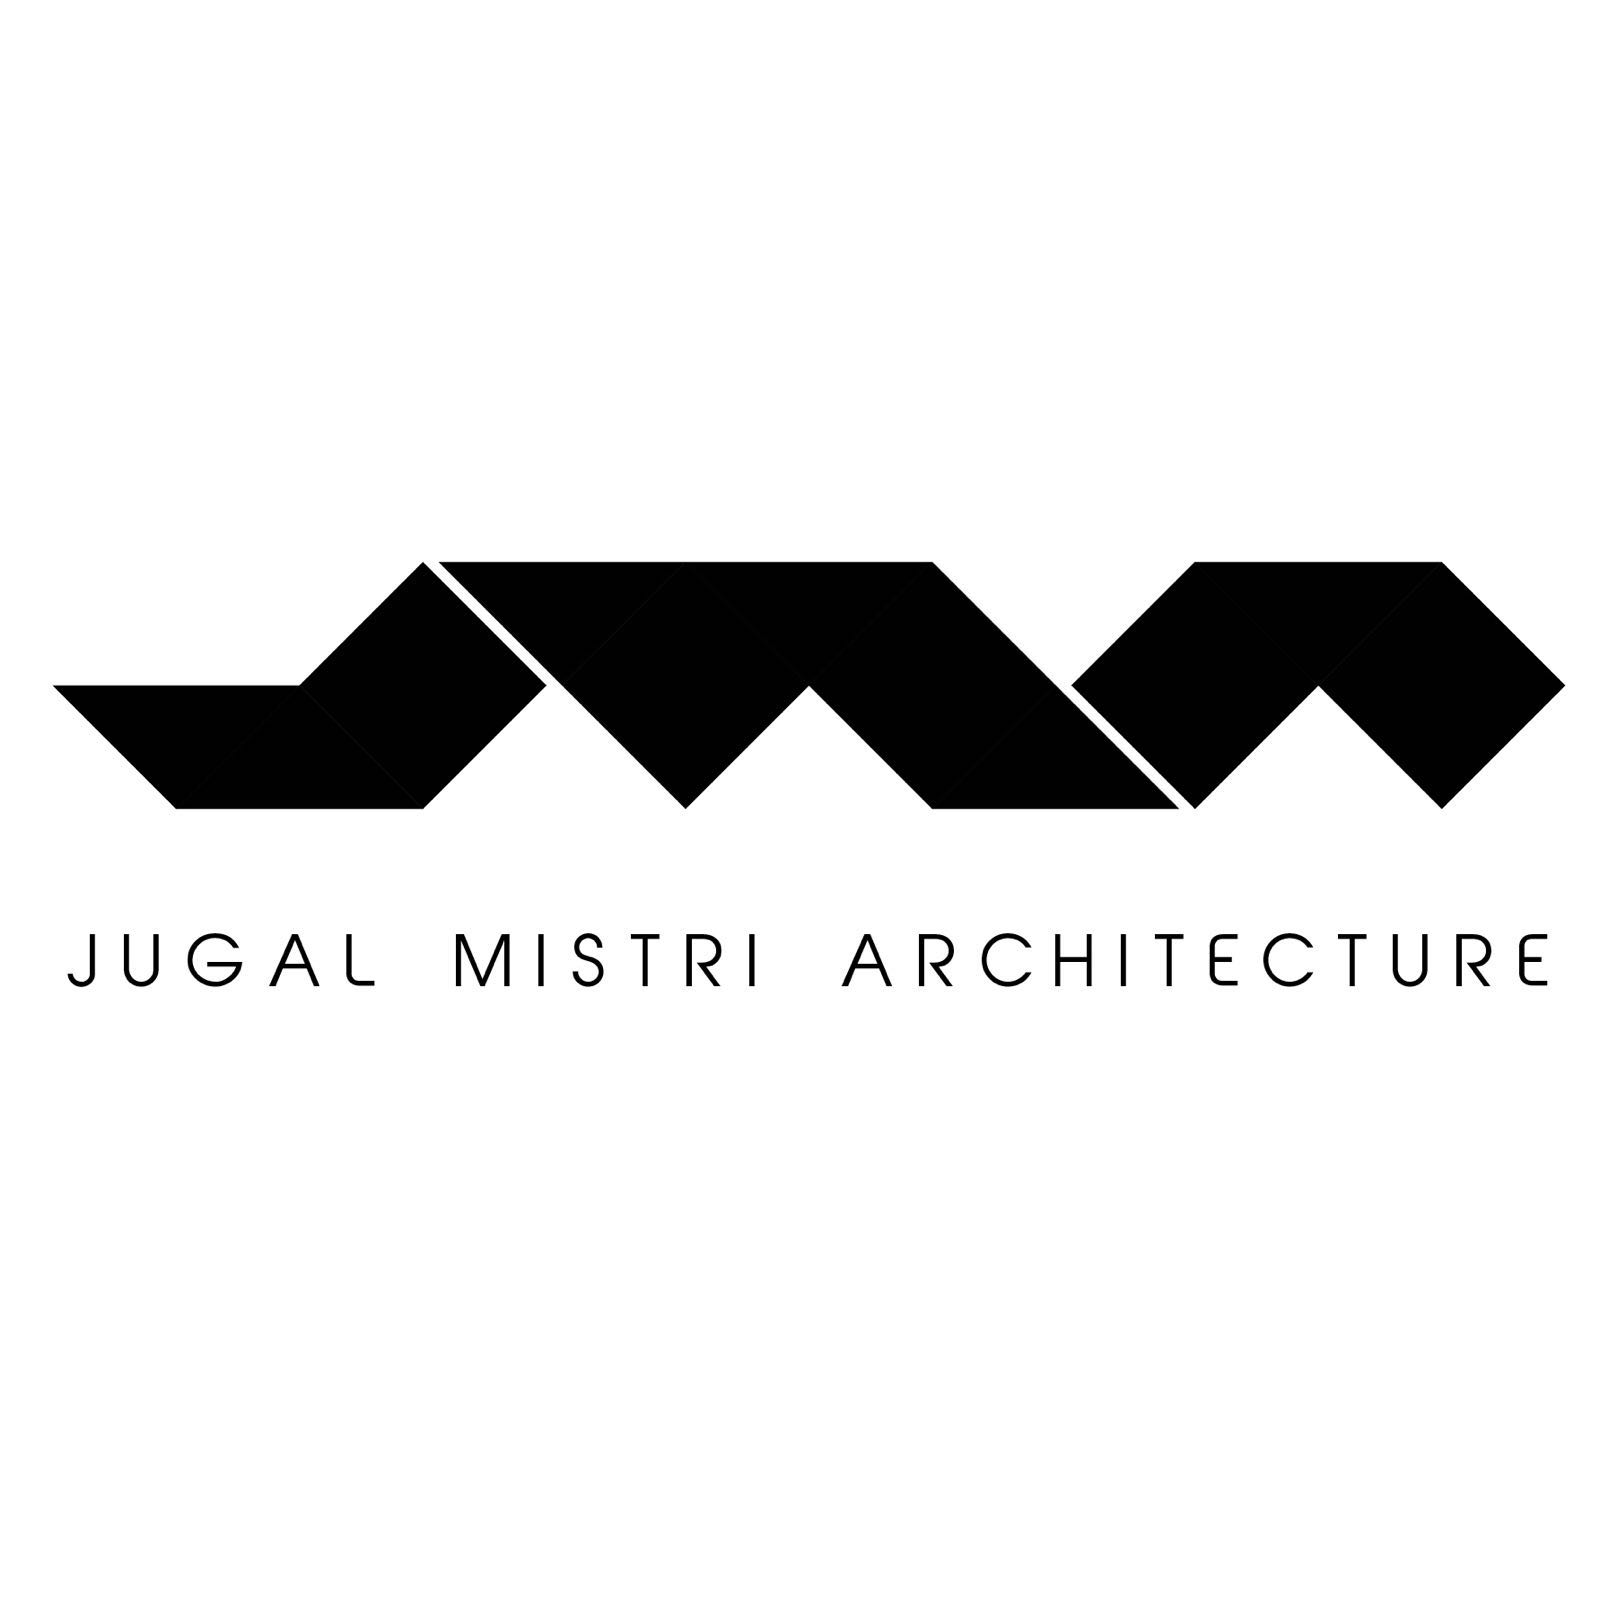 Jugal Mistri Arch logo